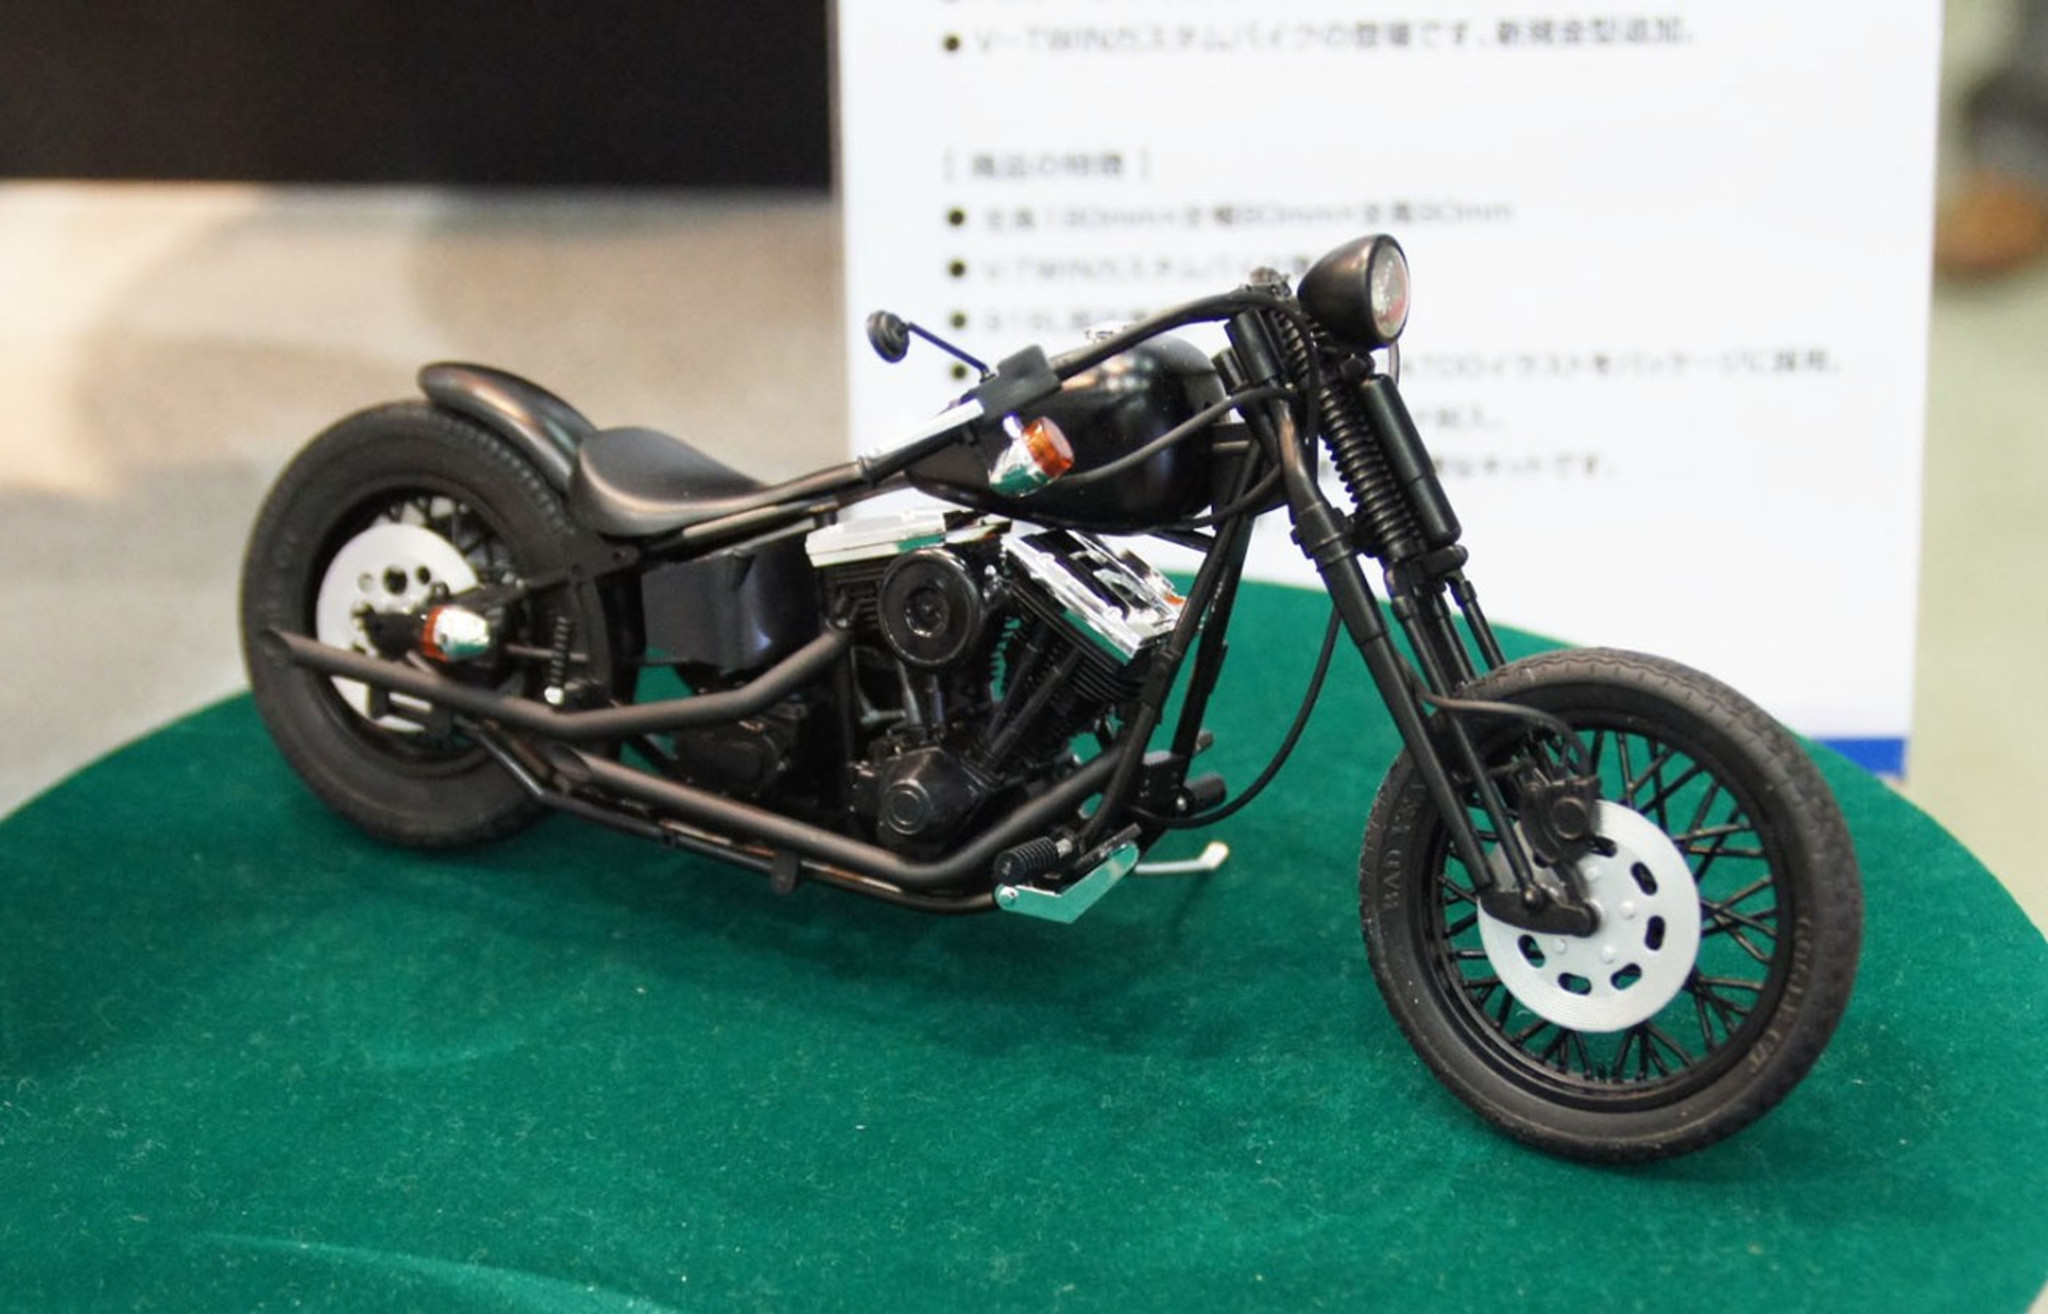 Aoshima Naked Bike 97 03428 Black Widow V-Twin Custom 1 -1123